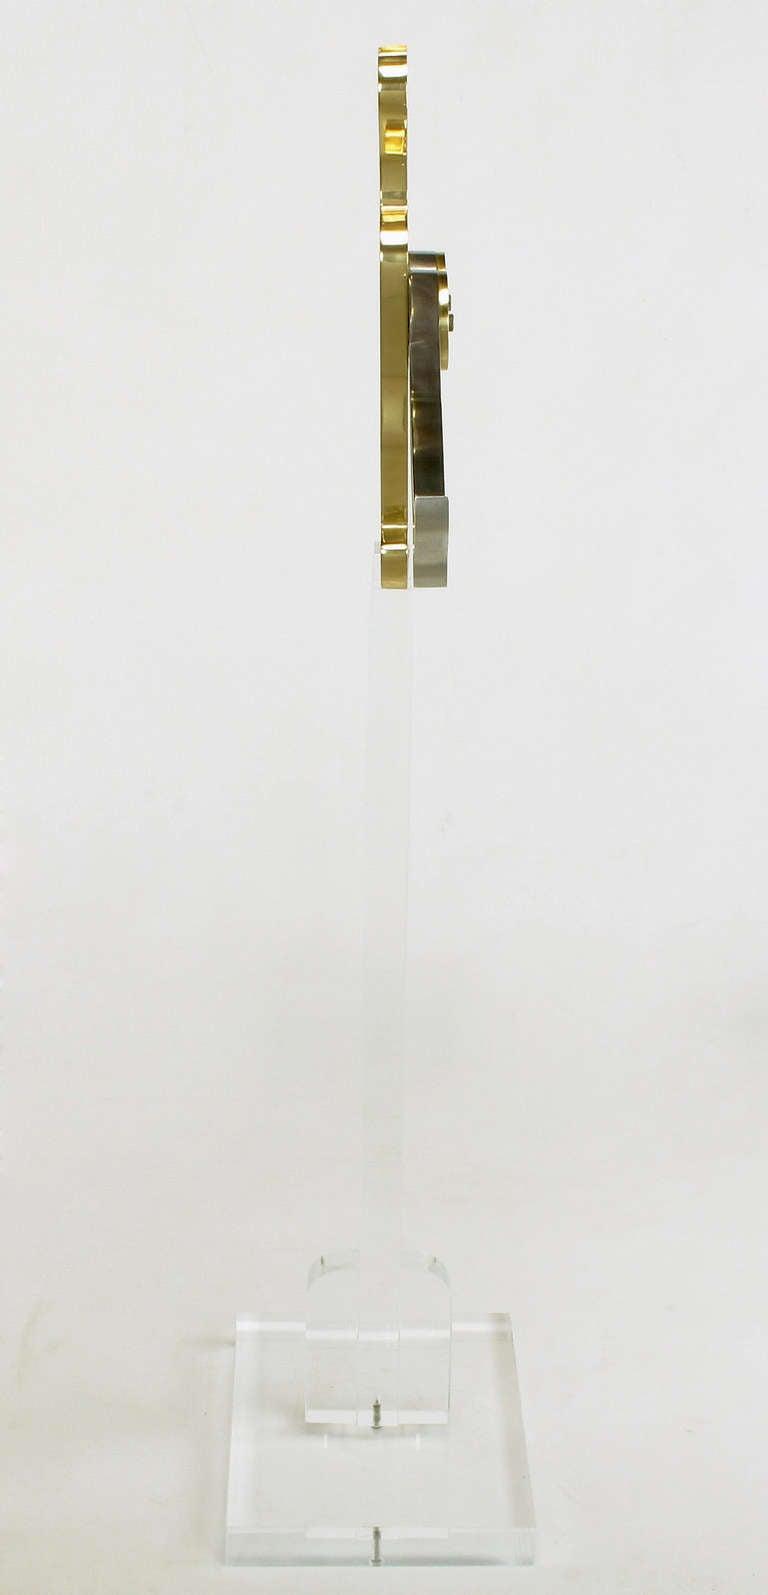 Eichengreem & Gensburg Brass and Aluminium Gymnast Sculpture on Lucite Stand For Sale 1